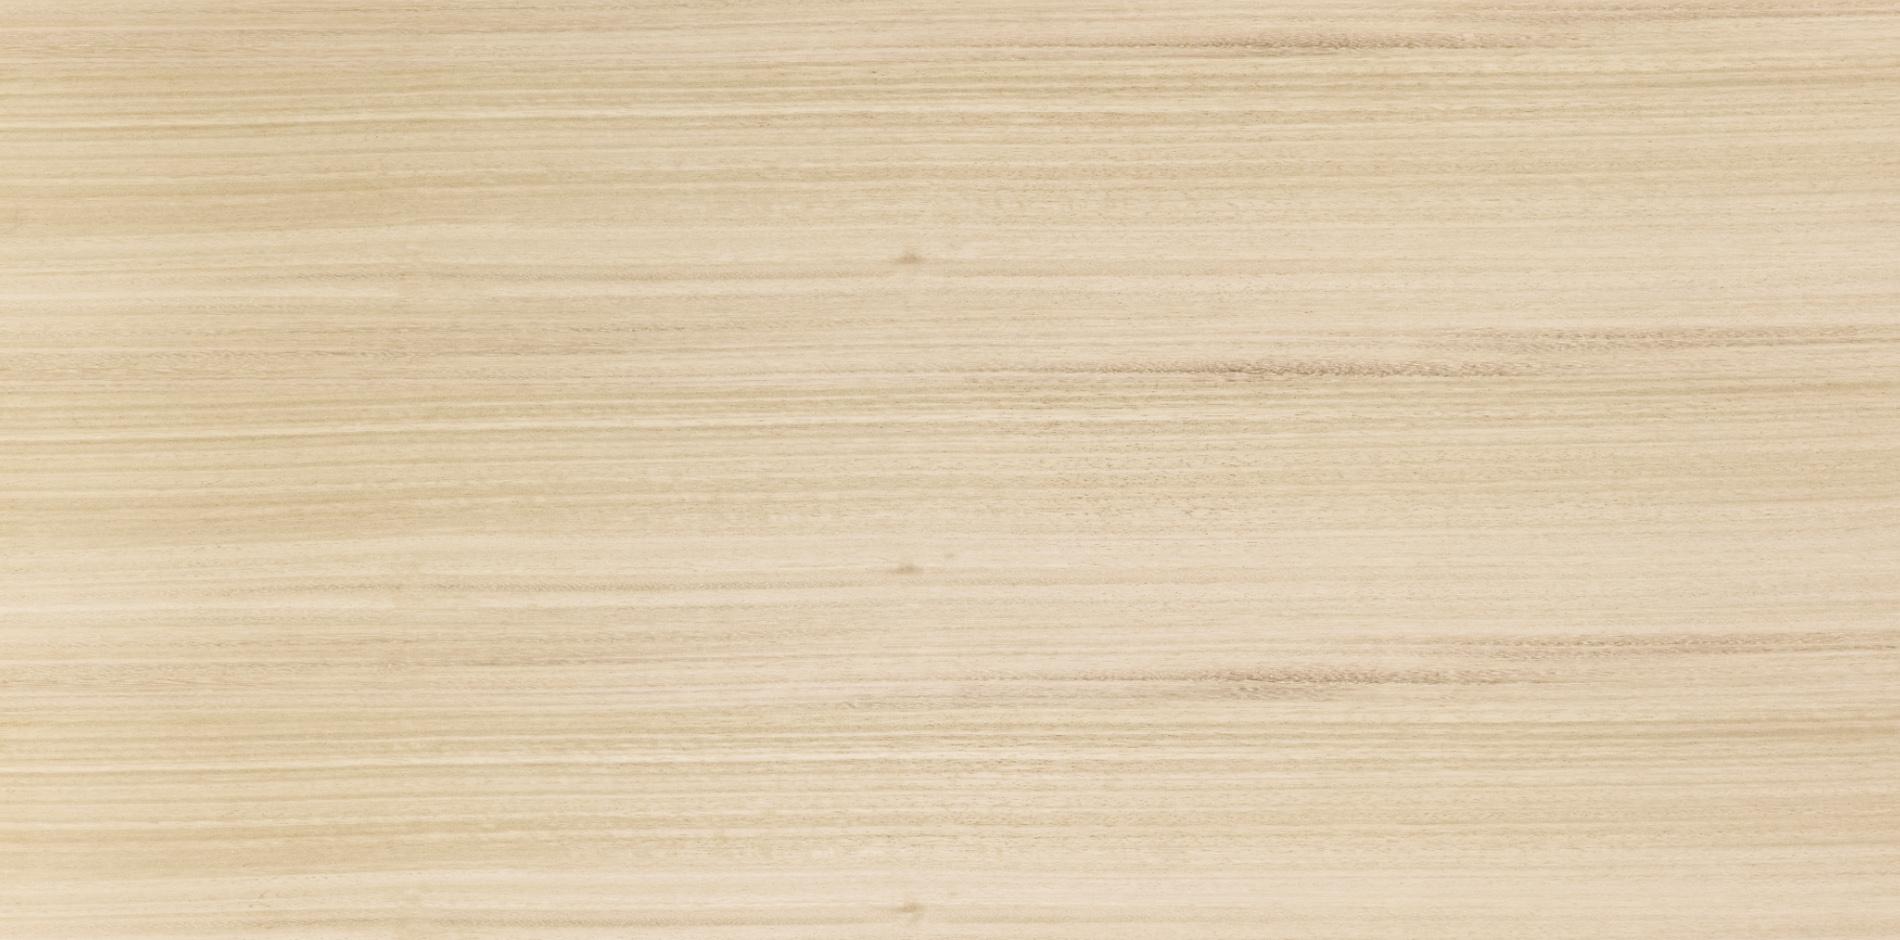 Garnica_plywood_eucalyptus_2